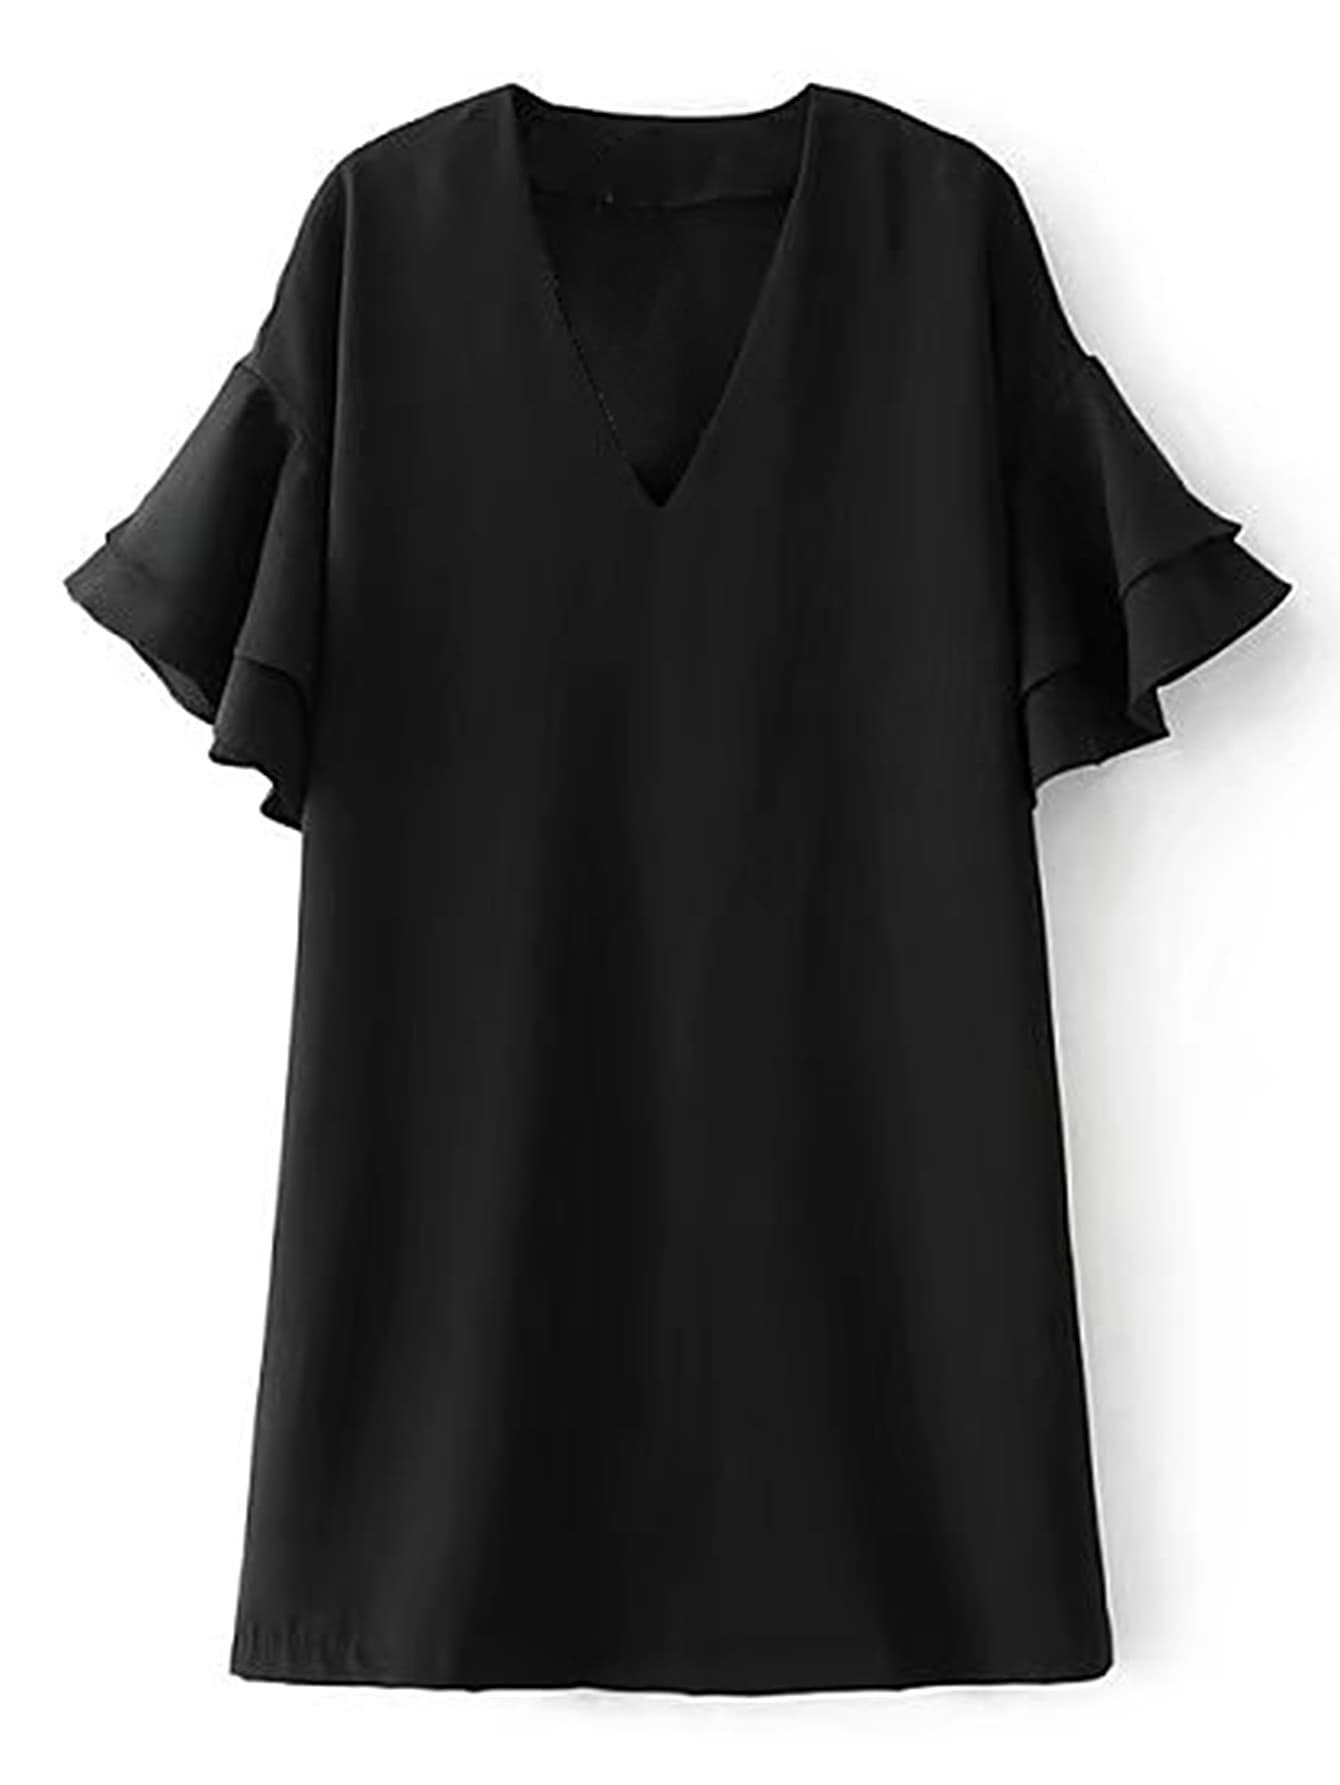 Layered Ruffle Sleeve Dress burgundy contrast sheer neck layered sleeve ruffle dress